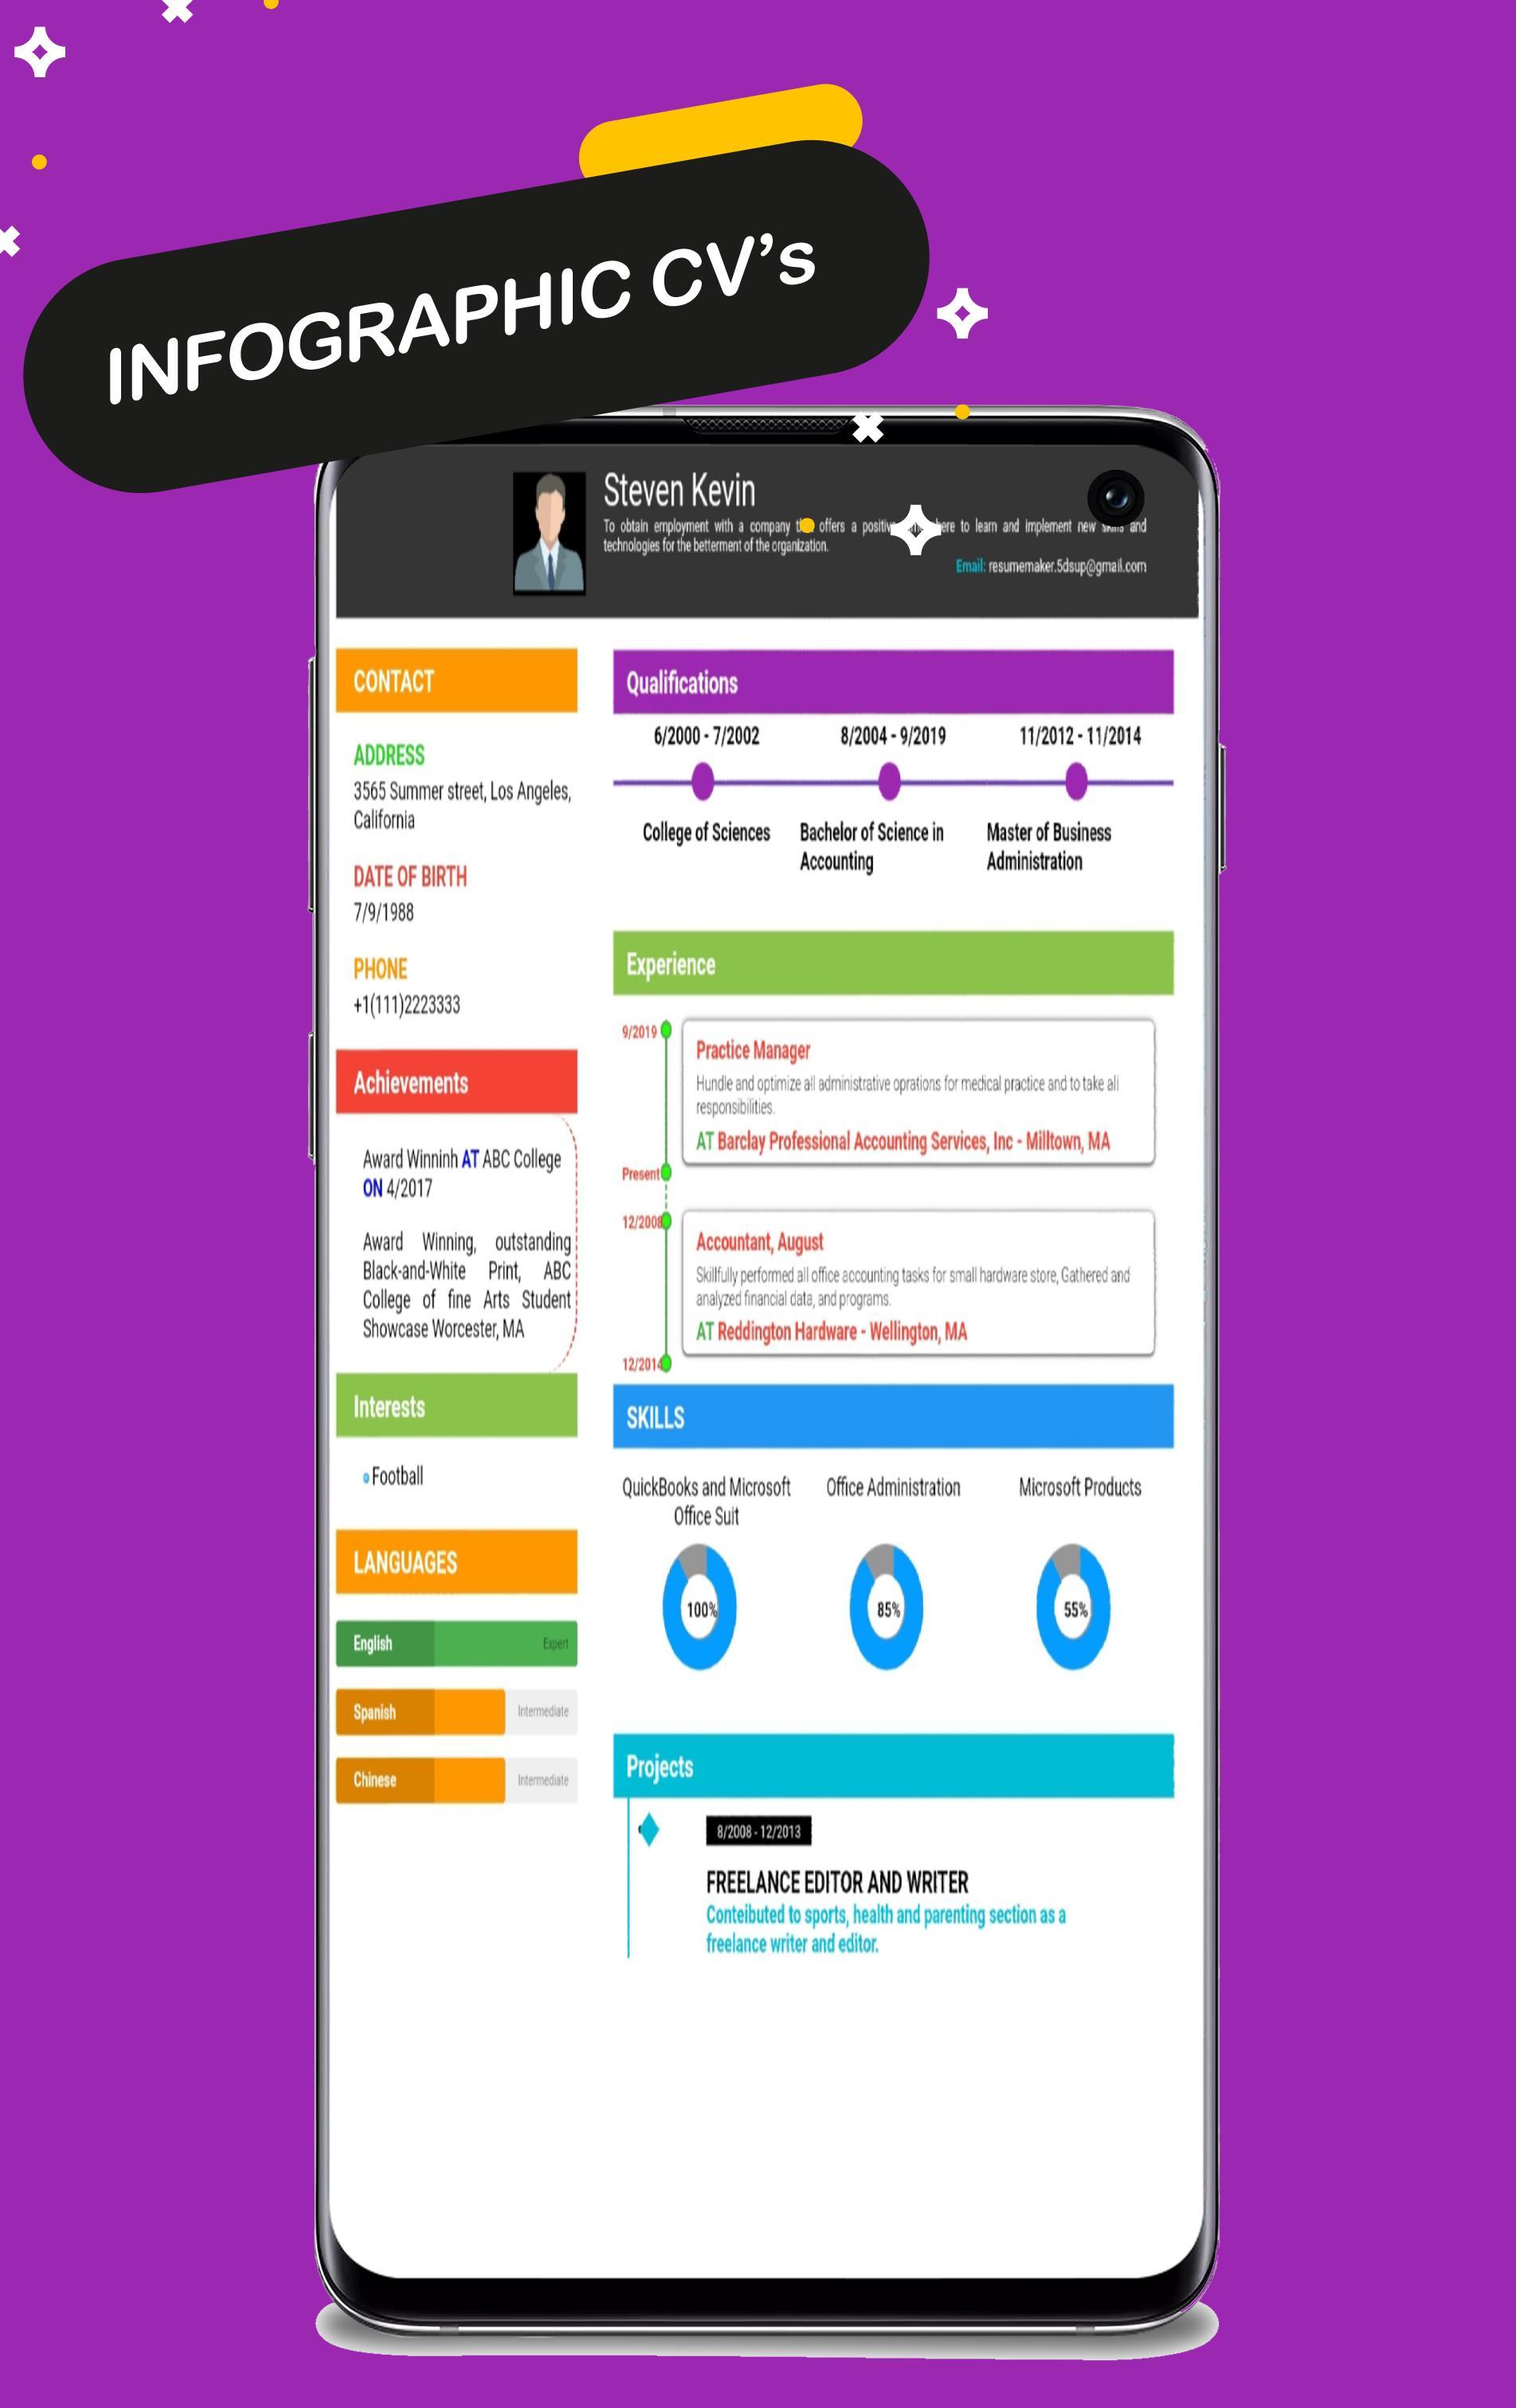 Free Resume Maker Cv Maker Templates Formats App For Android Apk